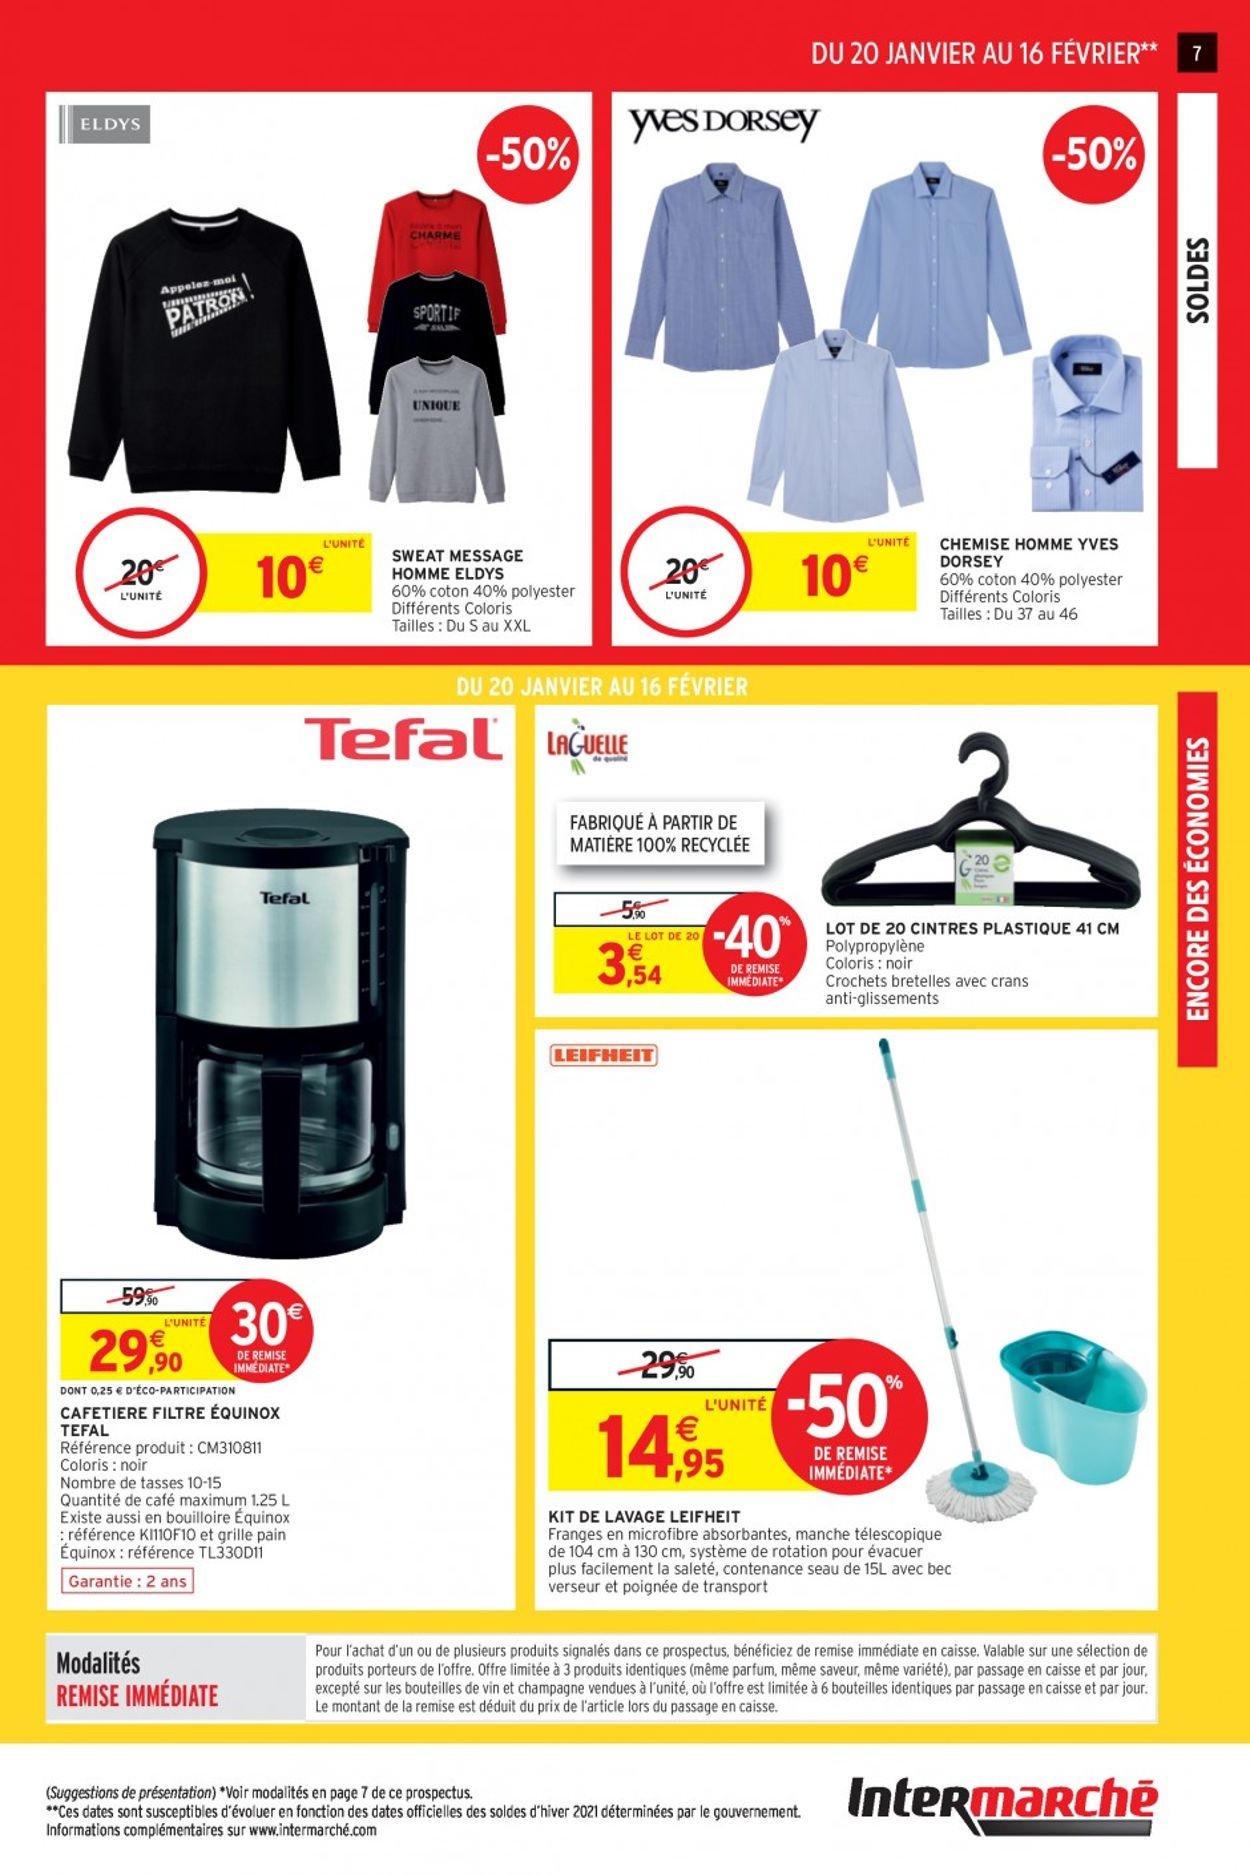 Intermarché Soldes 2021 Catalogue - 20.01-16.02.2021 (Page 7)